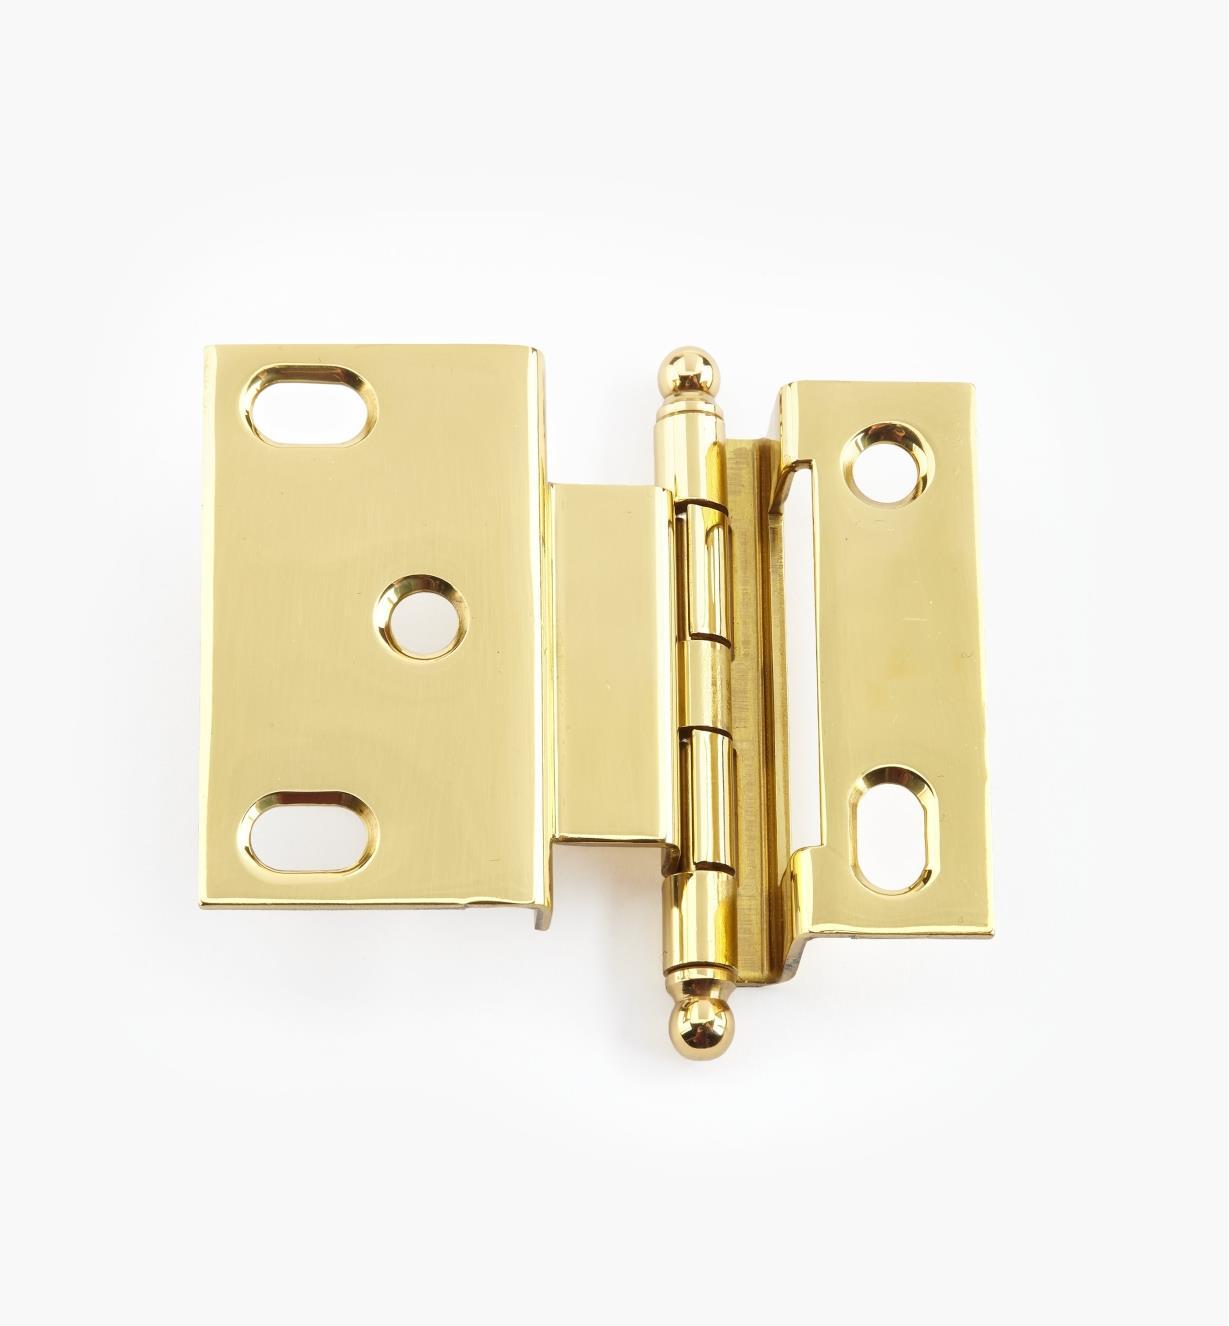 02H1204 - Polished Brass Offset Hinge/Ball